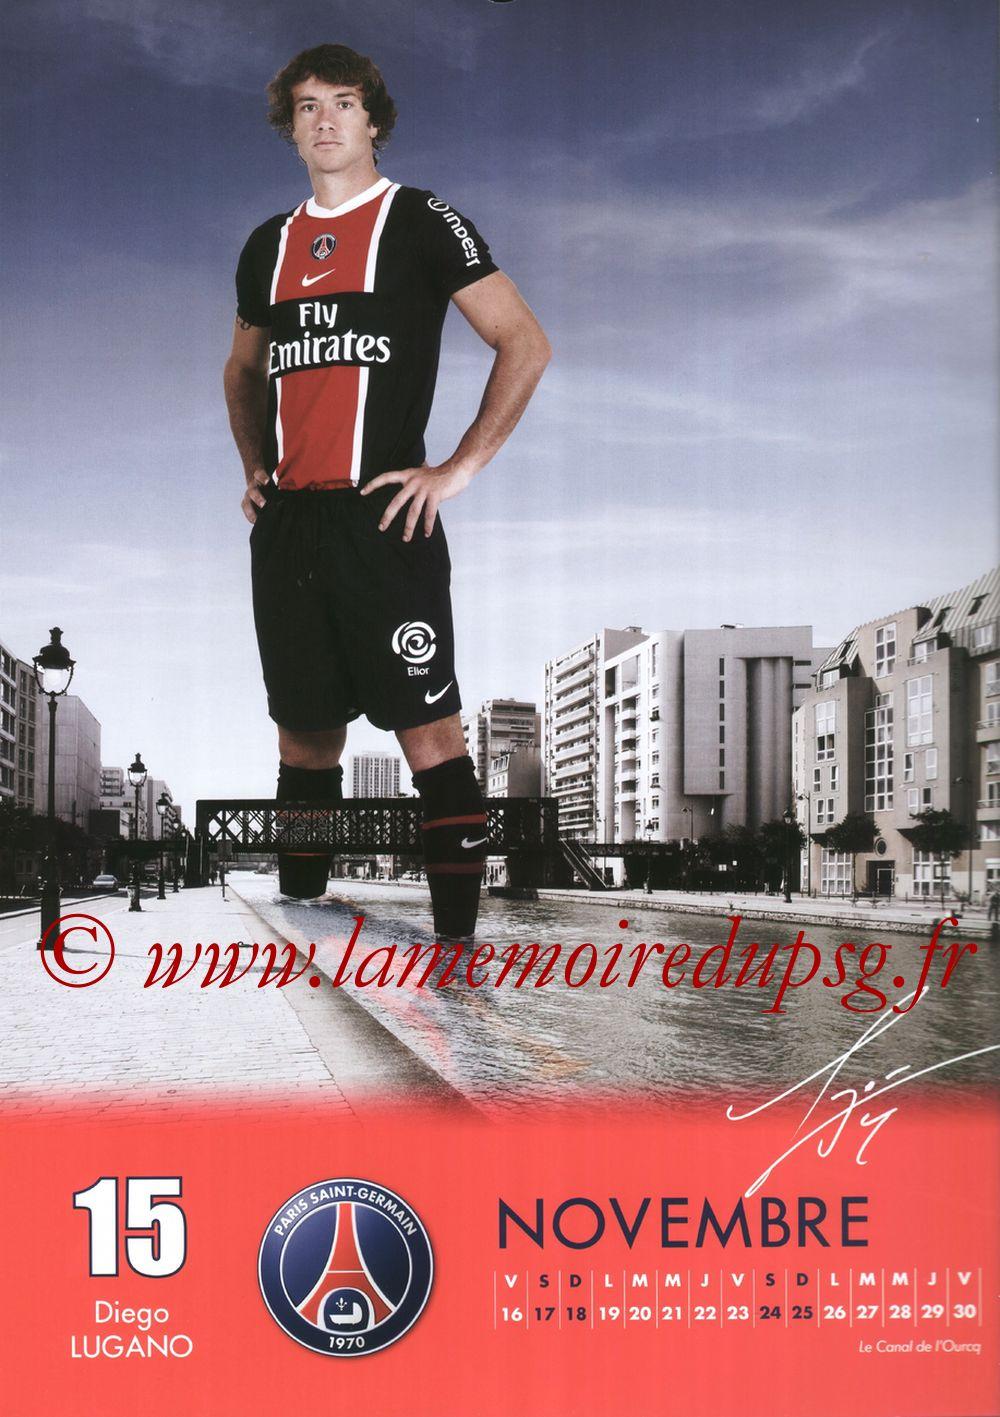 Calendrier PSG 2012 - Page 22 - Diego LUGANO